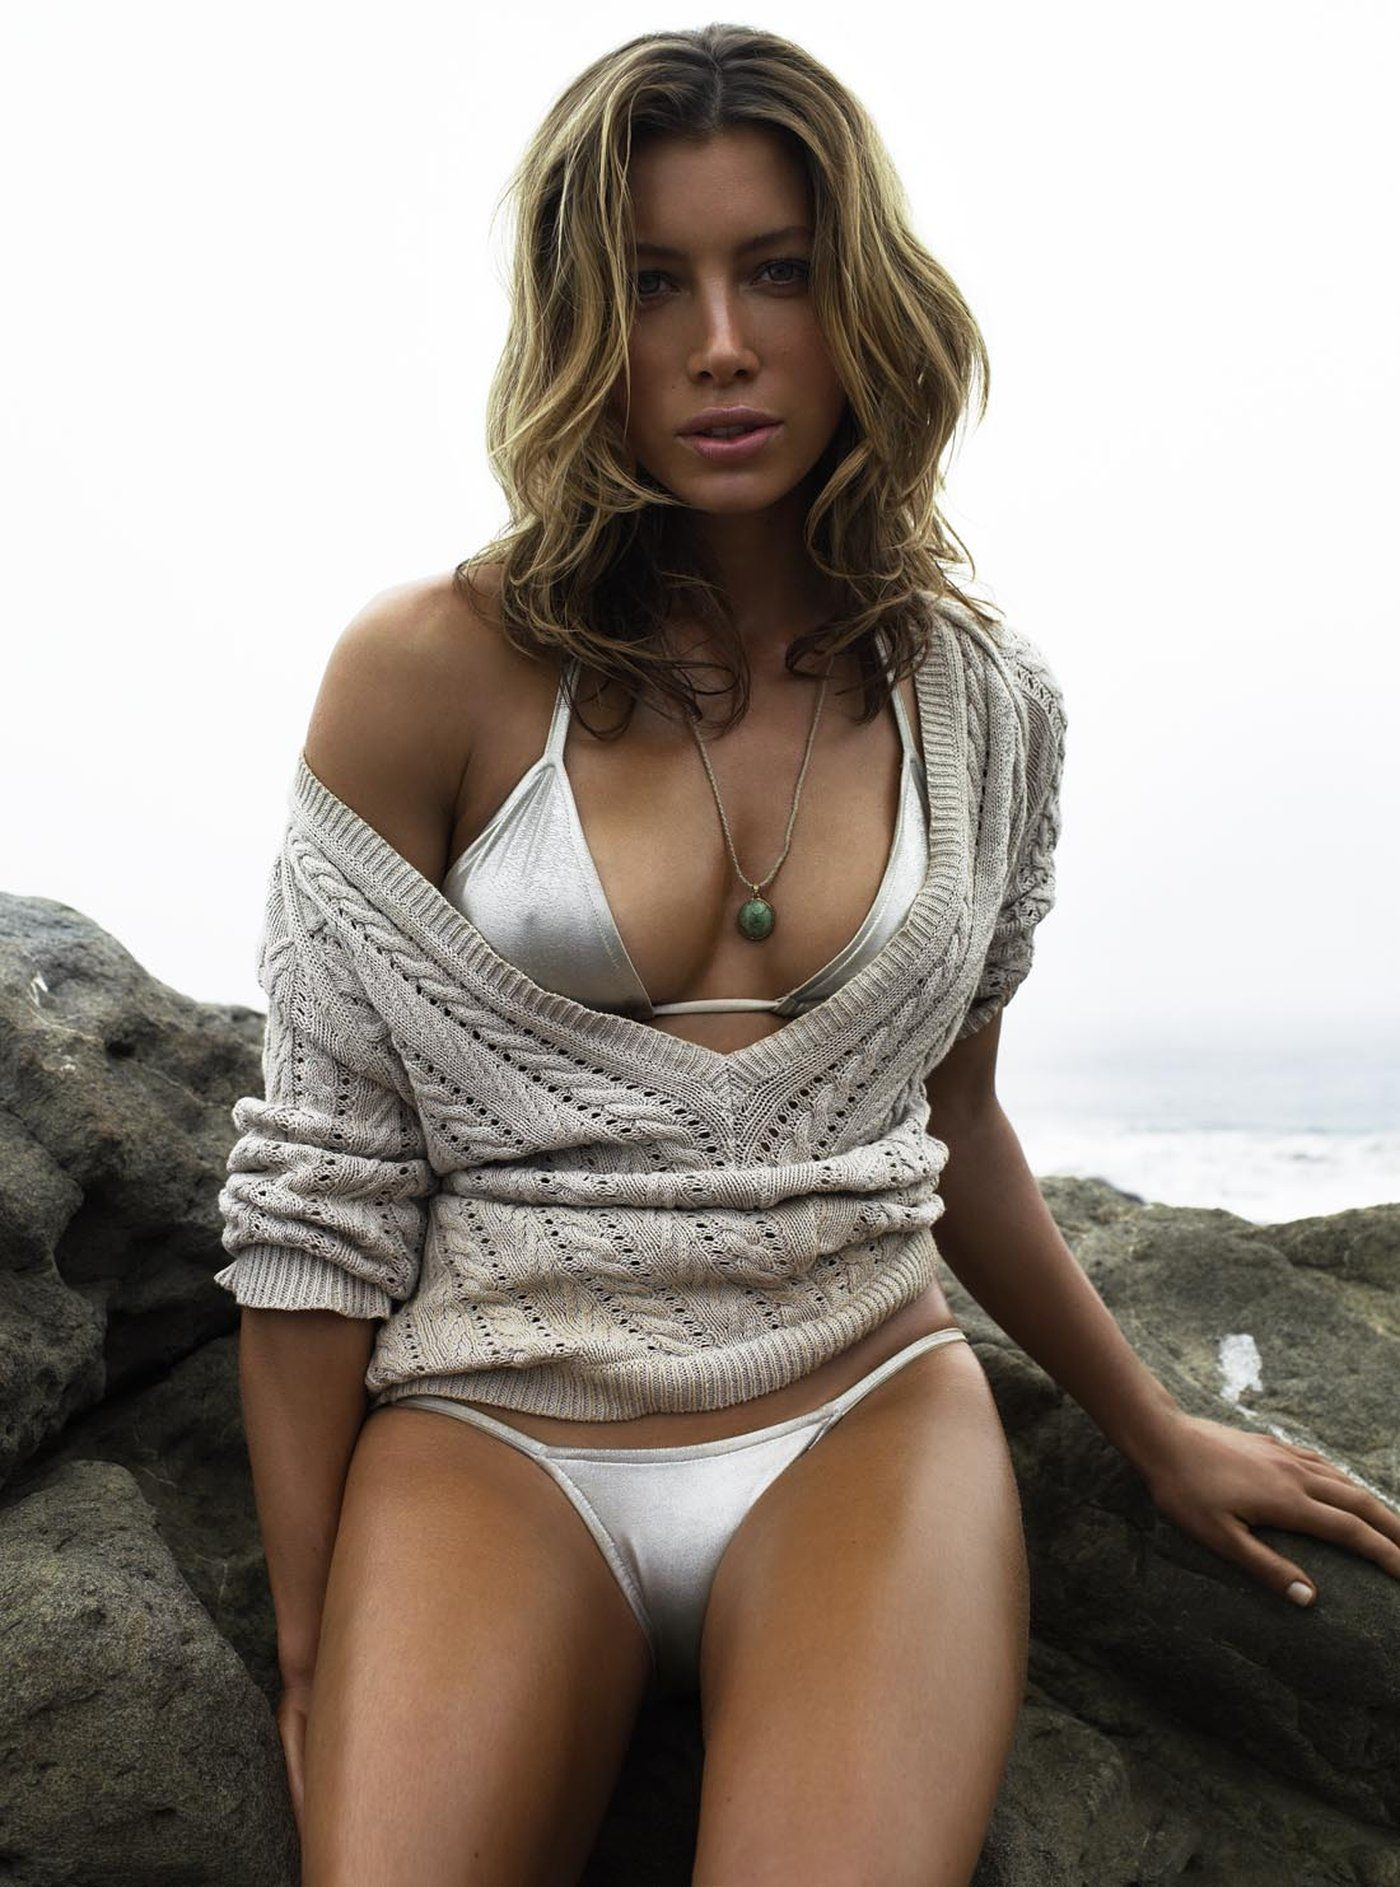 Erotica Jessica Biel nudes (65 foto and video), Tits, Fappening, Instagram, bra 2020